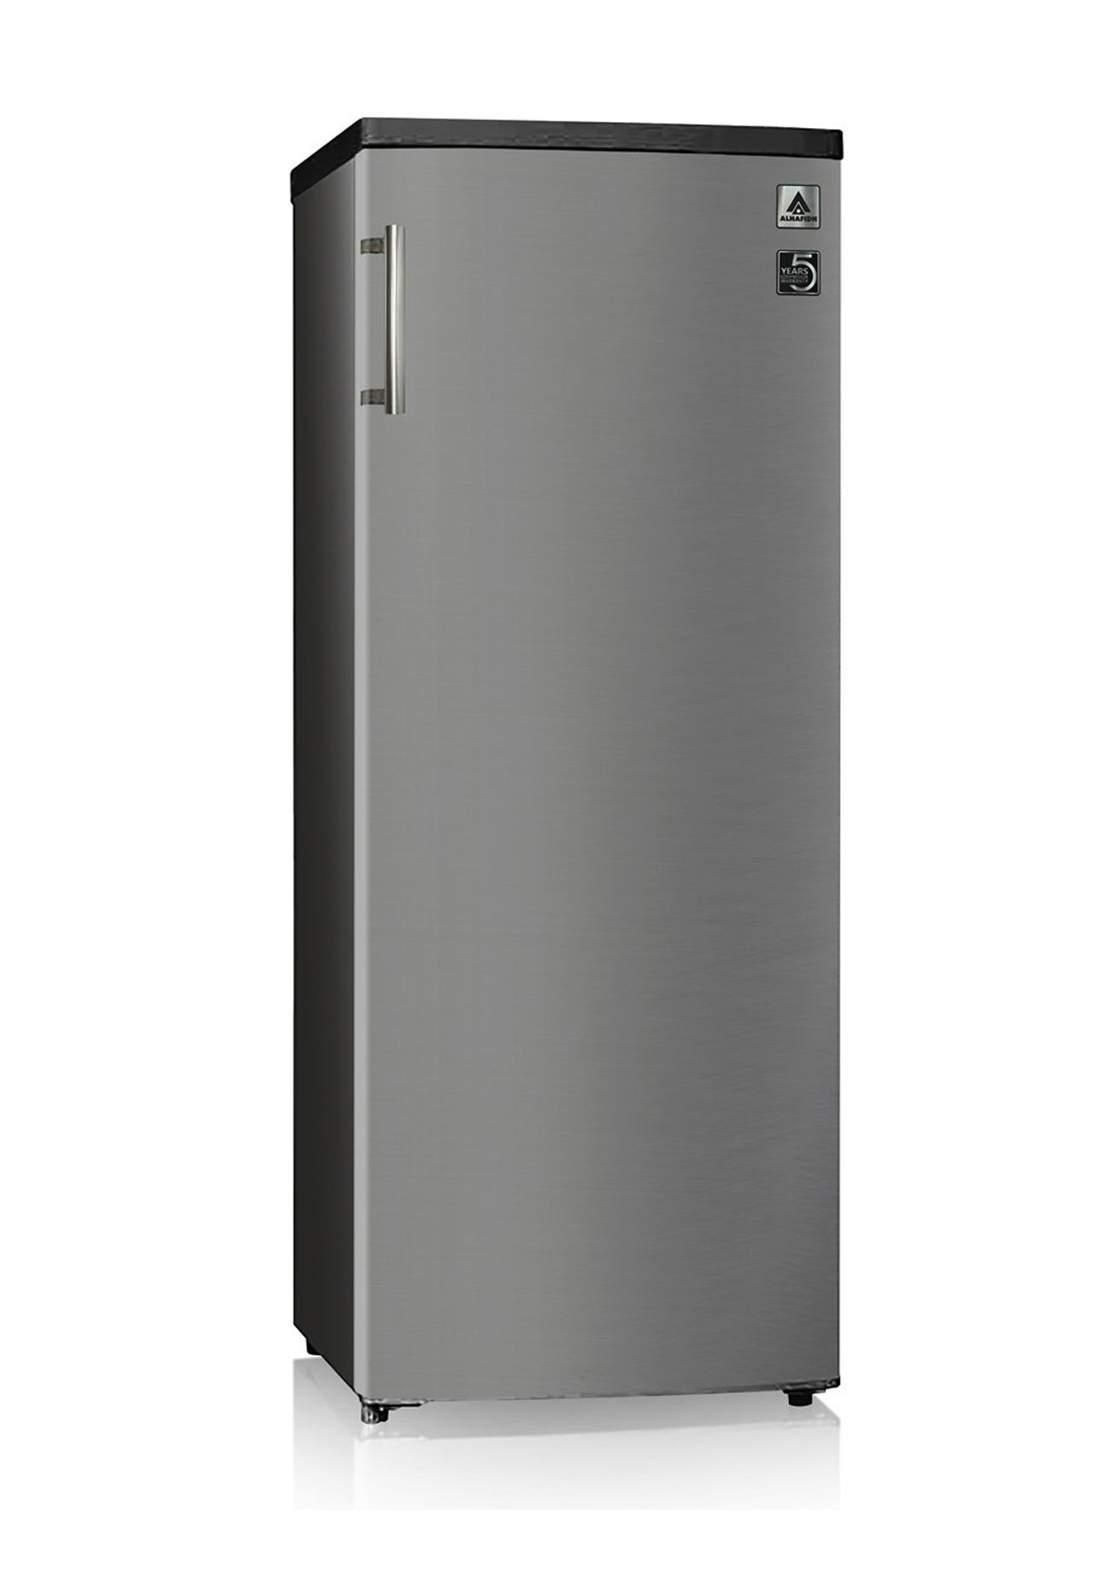 Alhafidh UFHA-325MSS Upright Freezer 11 ft مجمدة عامودية